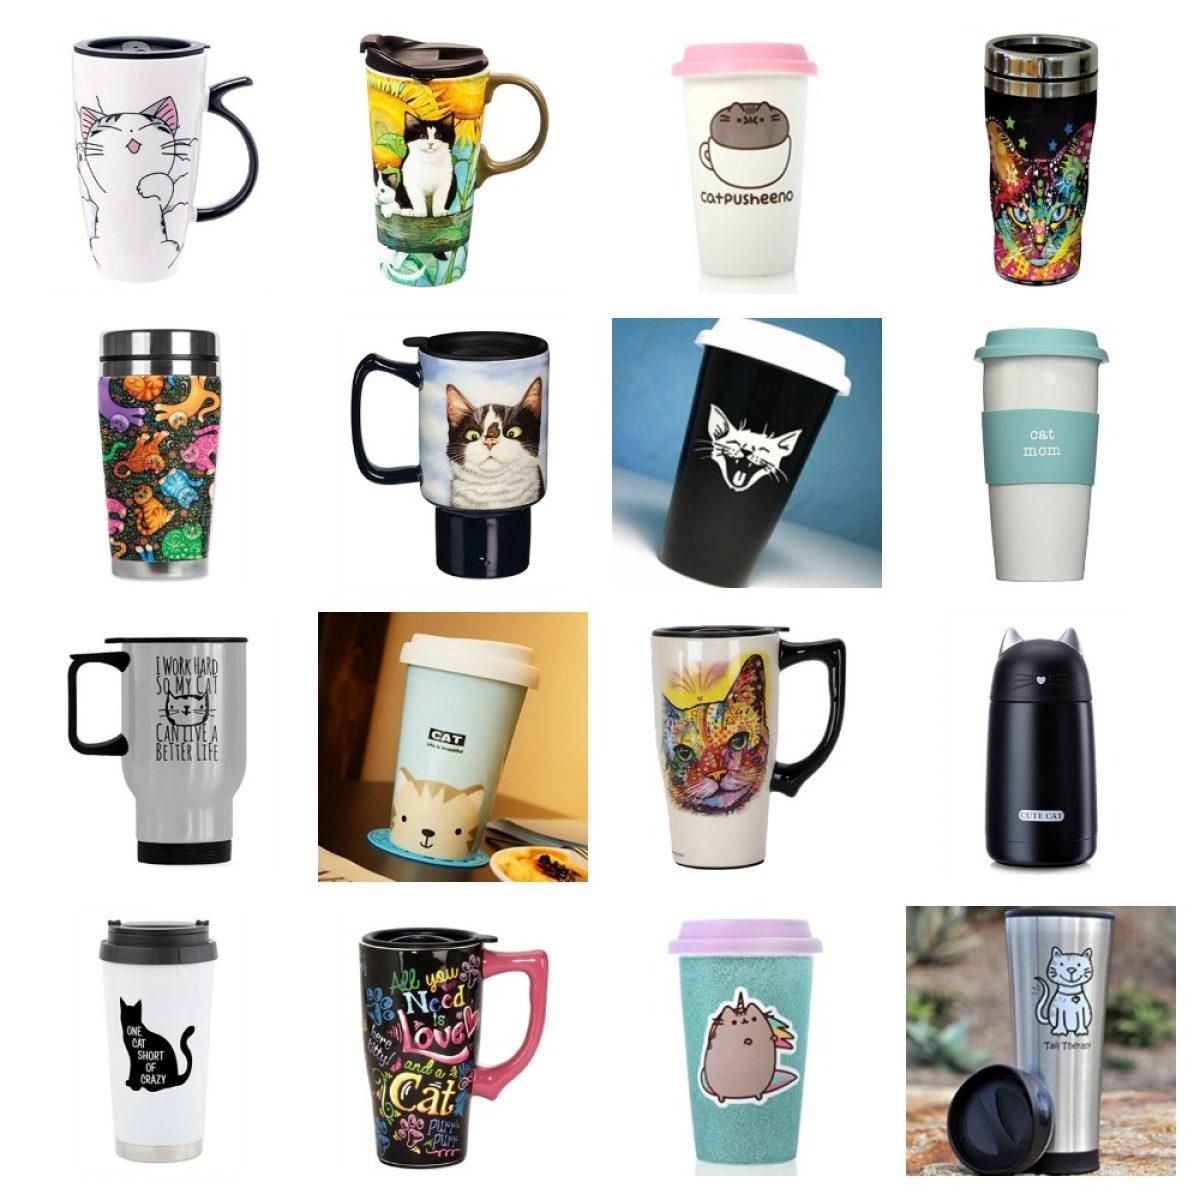 Toilet Mug with Spoon lid WC Plastic Coffee Mug Cap Cup Funny Mugs for Lovers